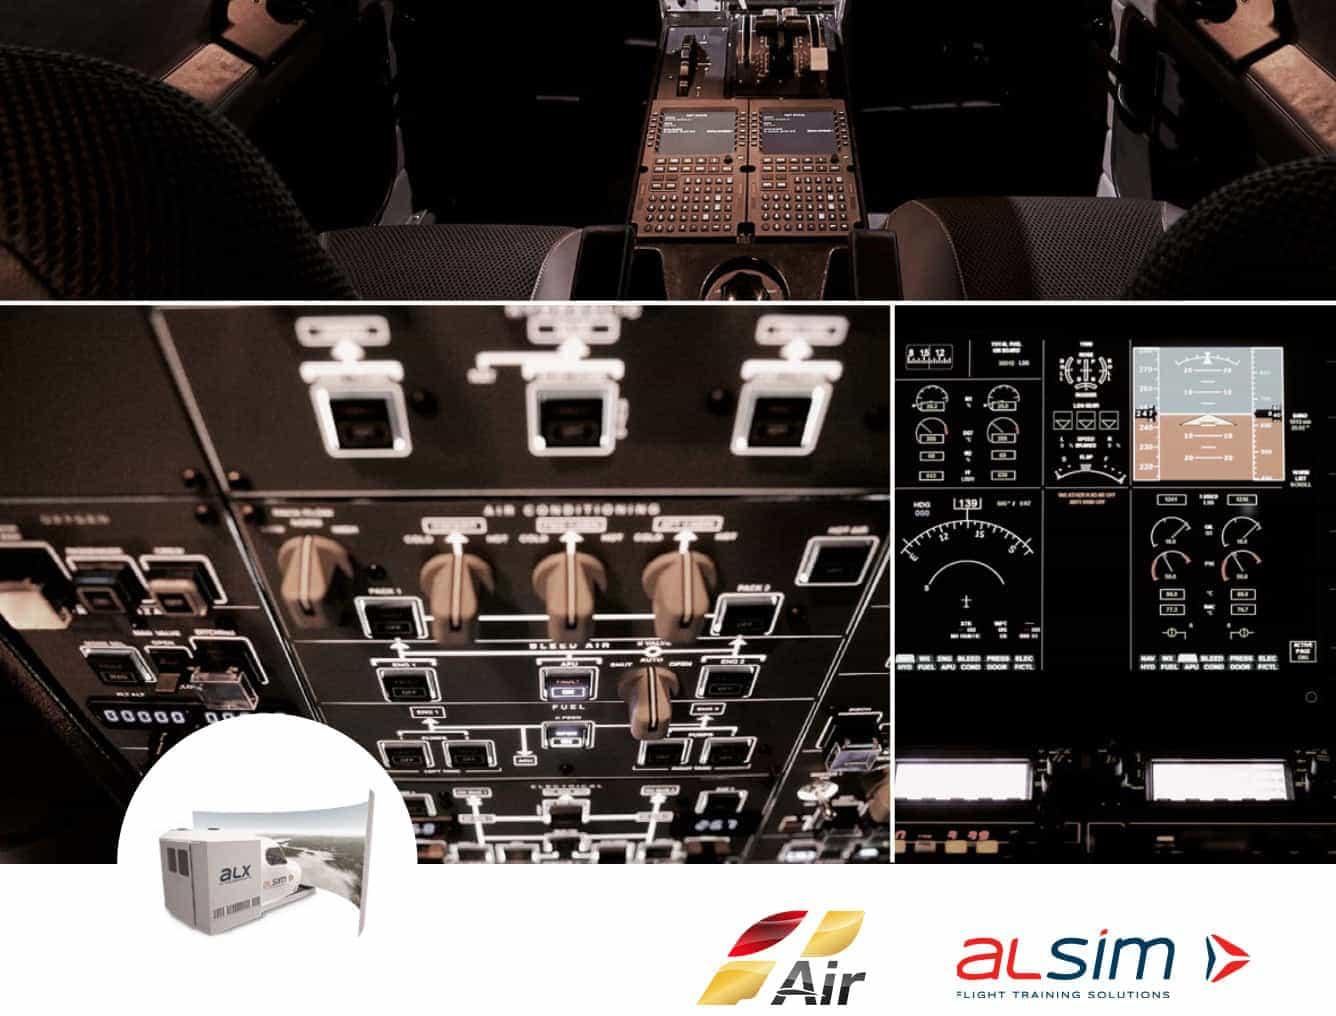 panel superior simulador vuelo alsim alx cockpit instrumentos